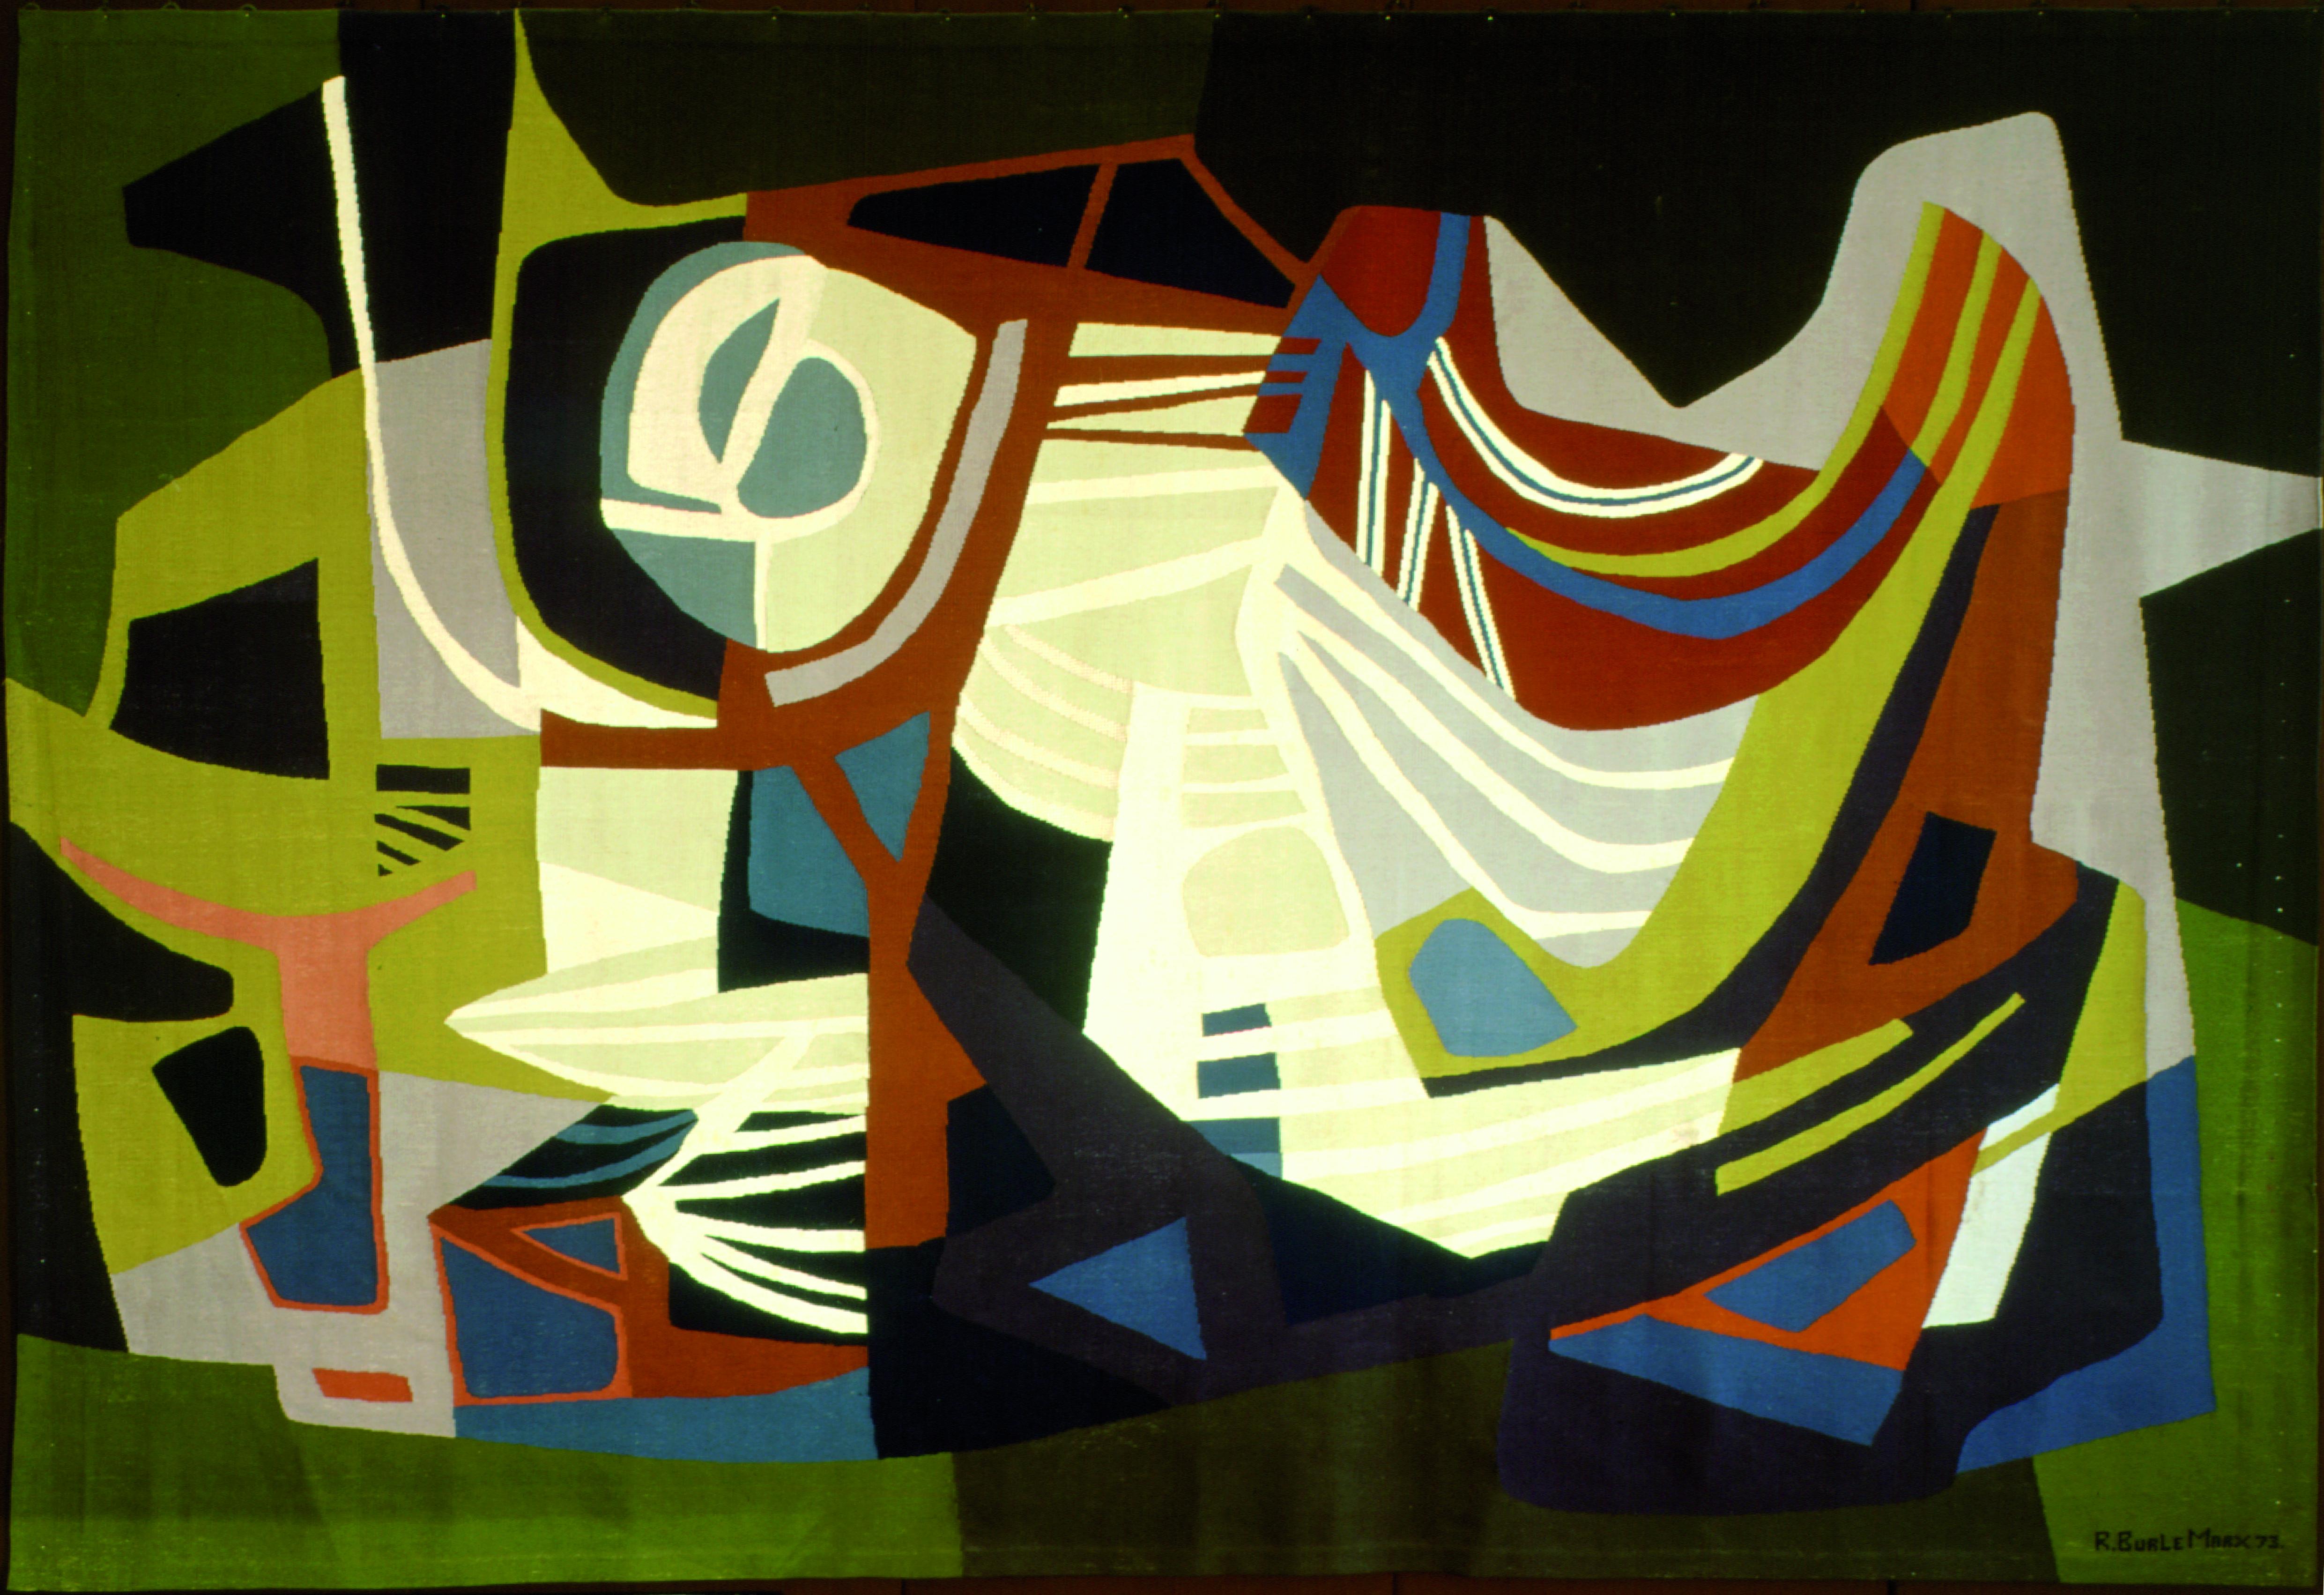 Sem título Autor: Roberto Burle Marx Ano: 1973 Técnica: Tapeçaria  Dimensões: 328m x 483m